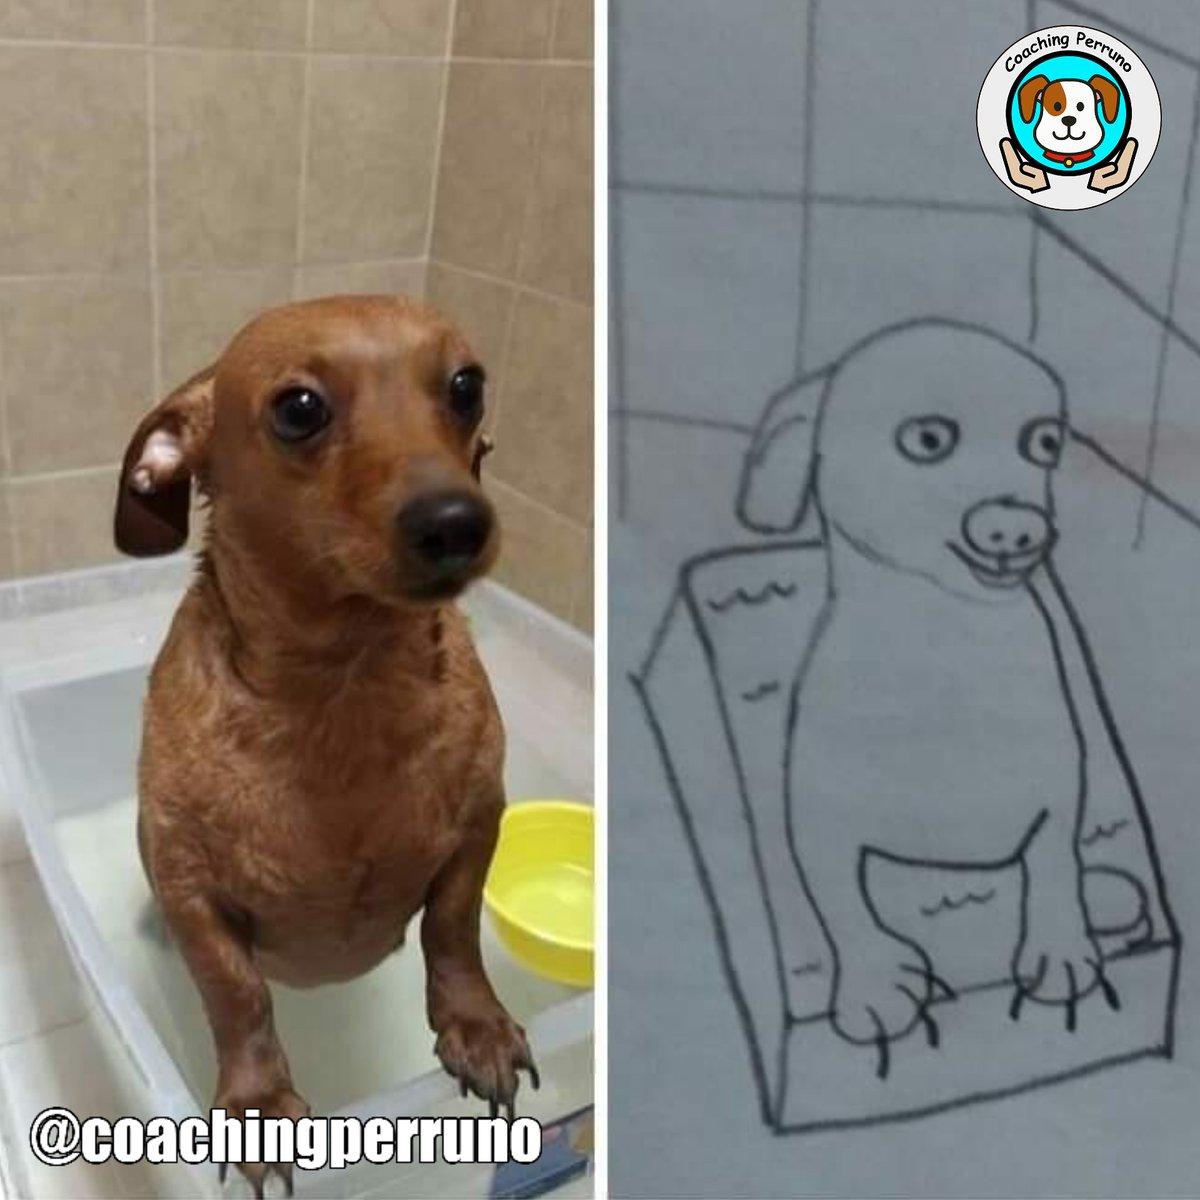 El dibujo es mi pasión #perros #dogs #mascotas #petsoftheday #petstagram #dogstagram #funnypets #pets #ilovedogs#petslovers #funnydogs #dogsloverspic.twitter.com/bSwAGlcJ4n